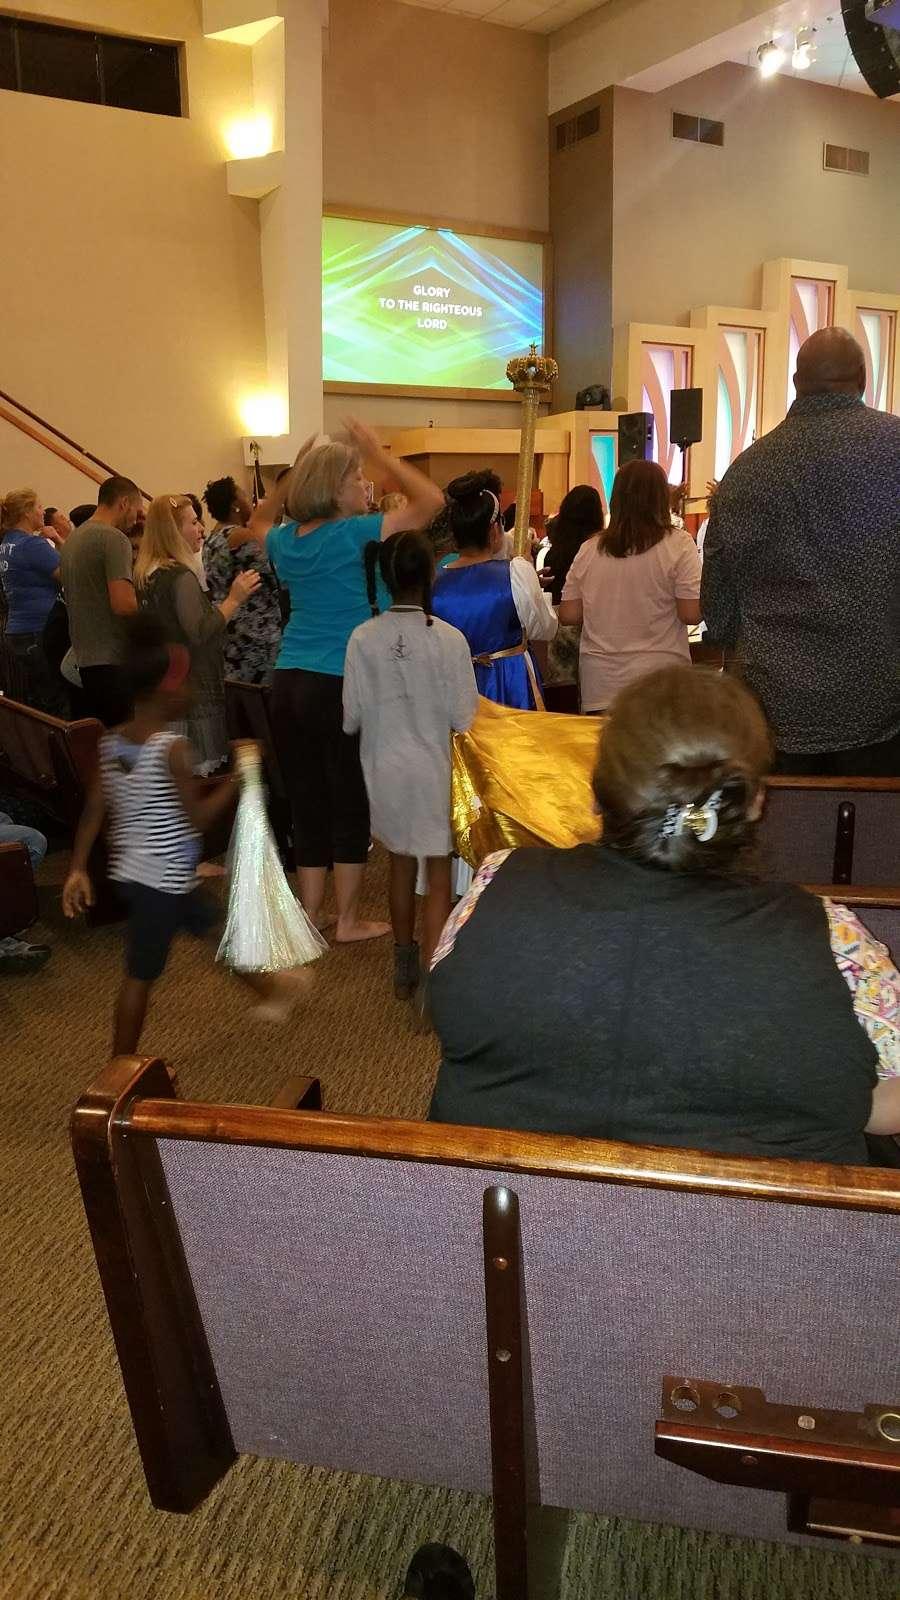 Christian World Ministries - church  | Photo 6 of 9 | Address: 6633 Walzem Rd, San Antonio, TX 78239, USA | Phone: (210) 657-5187